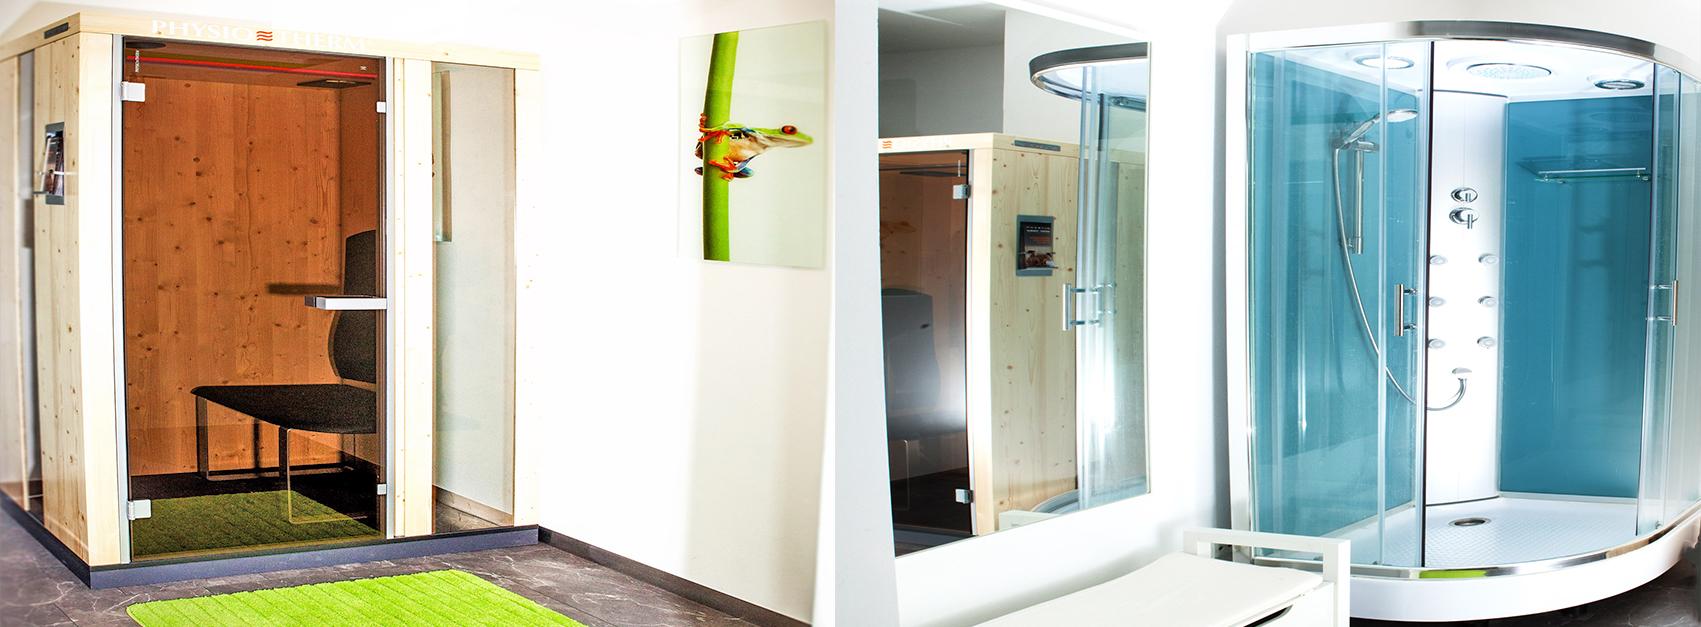 EMS-Studio®-Unterhaching-Wärmekabine-Physio-Therm Wellnessdusche EMS